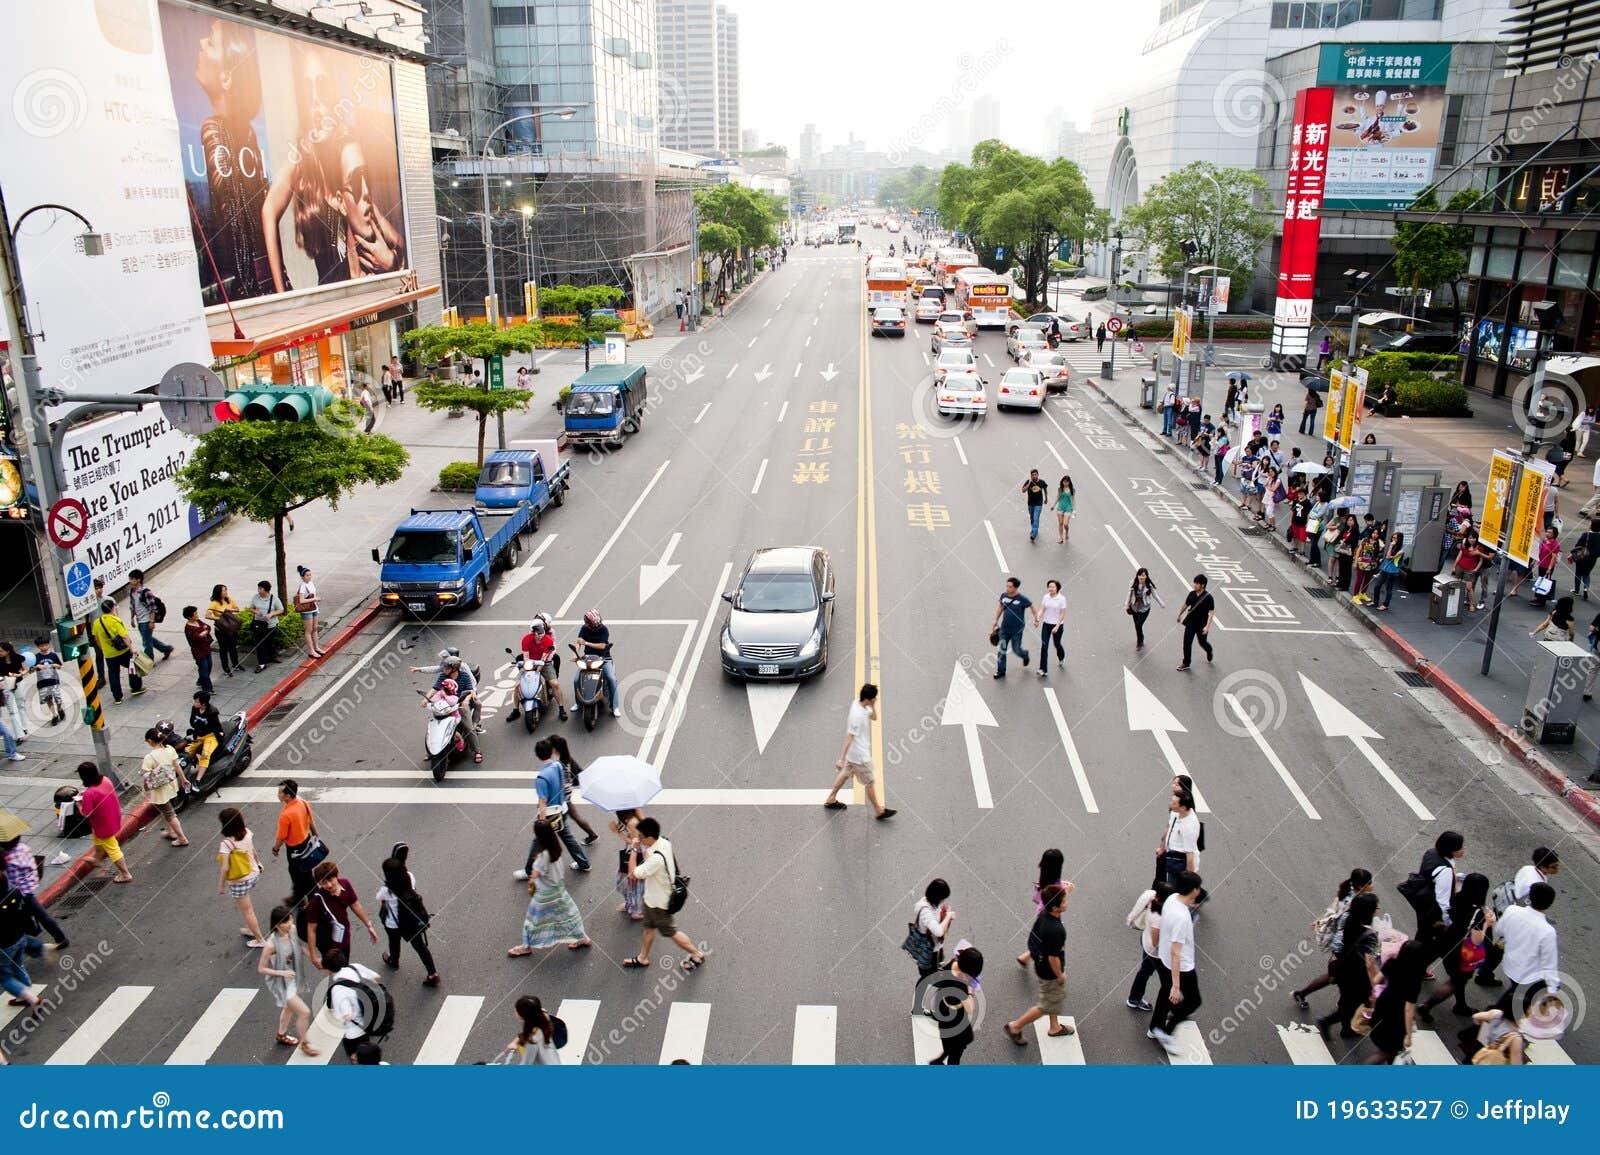 The view of taipei street view